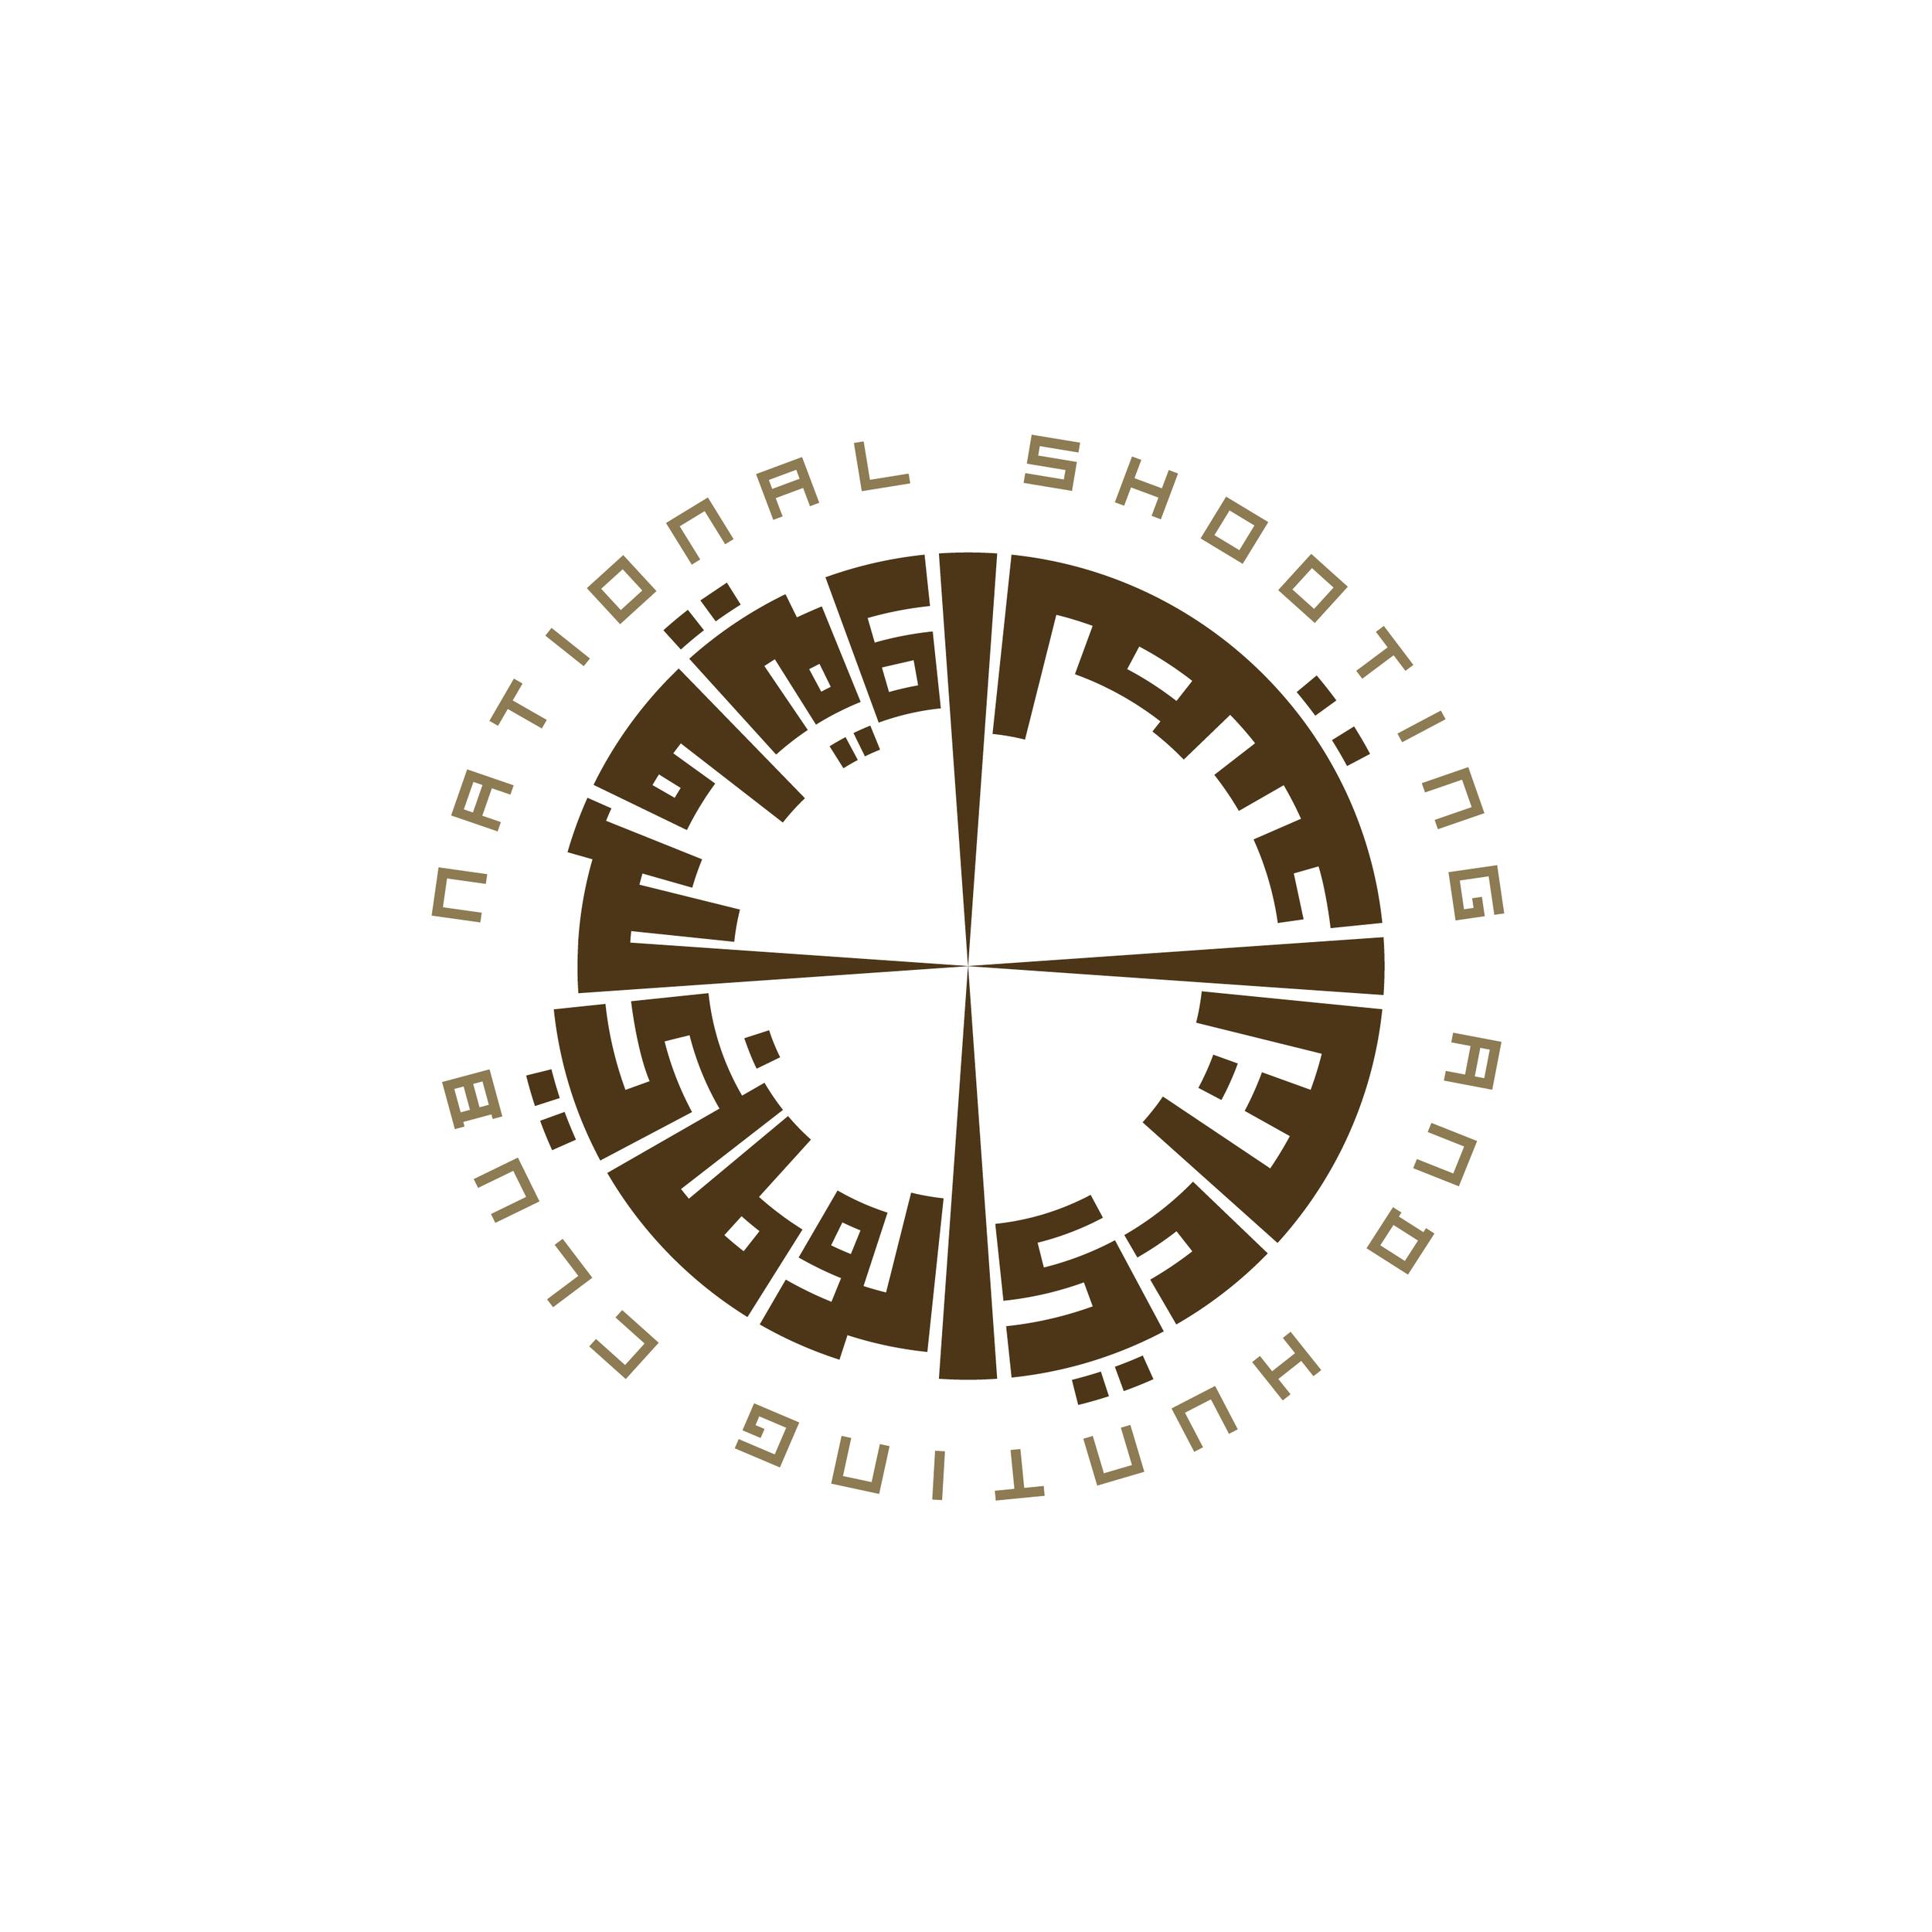 National Shooting and Hunting Club